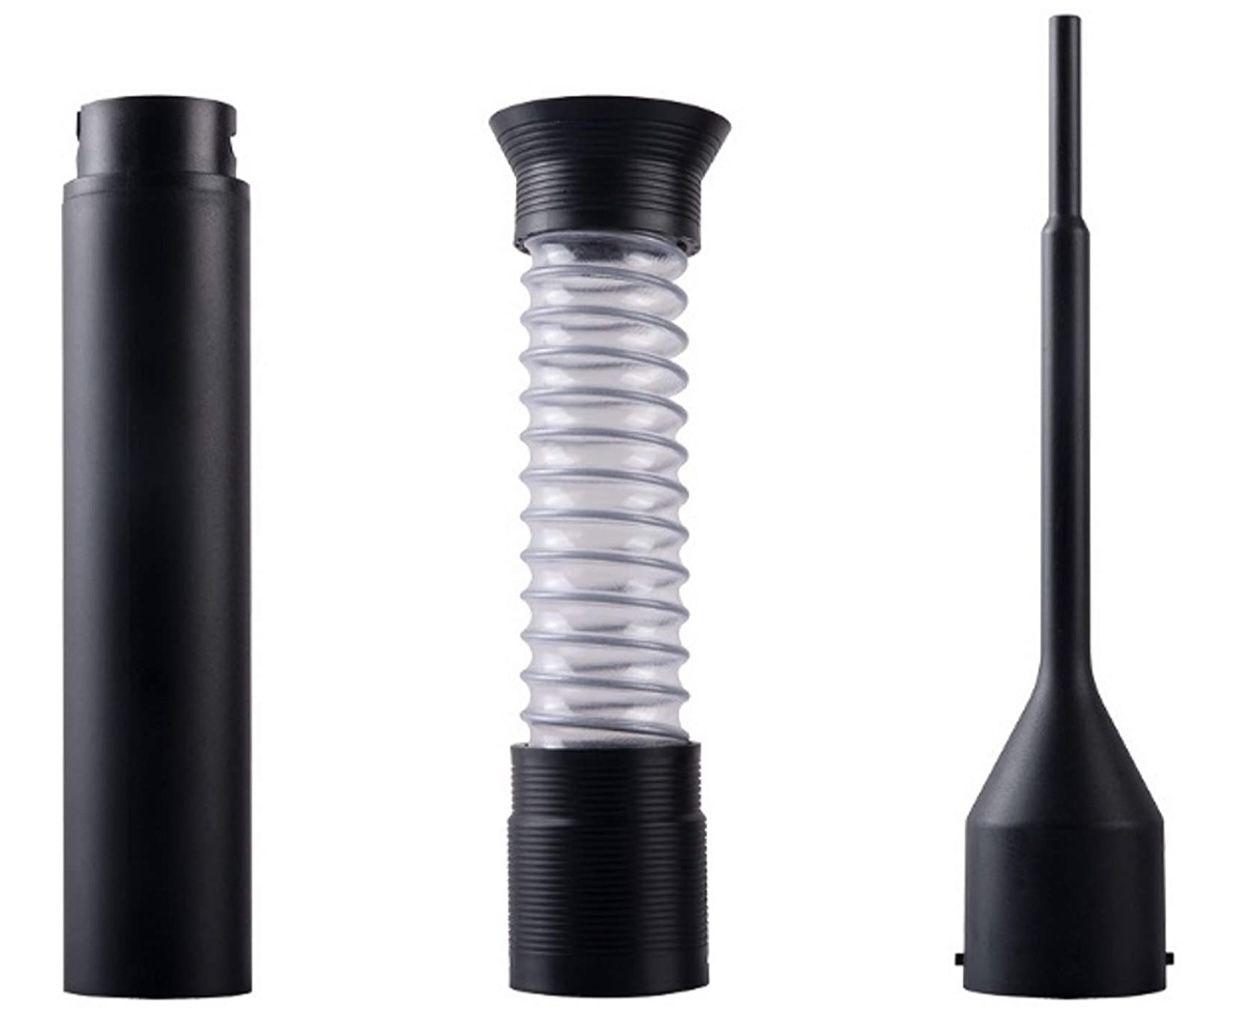 Bosch Professional GBL 18V 120 Akku Gebläse ohne Akkus und Ladegerät für 55,99€ (statt 68€)